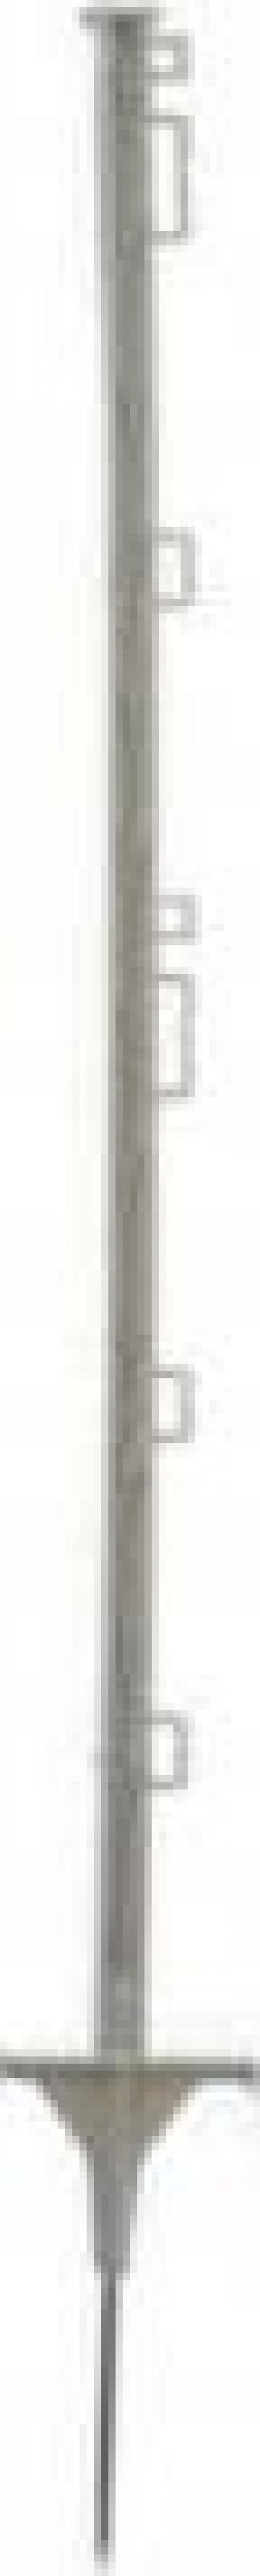 Stalp plastic gard electric 160 cm